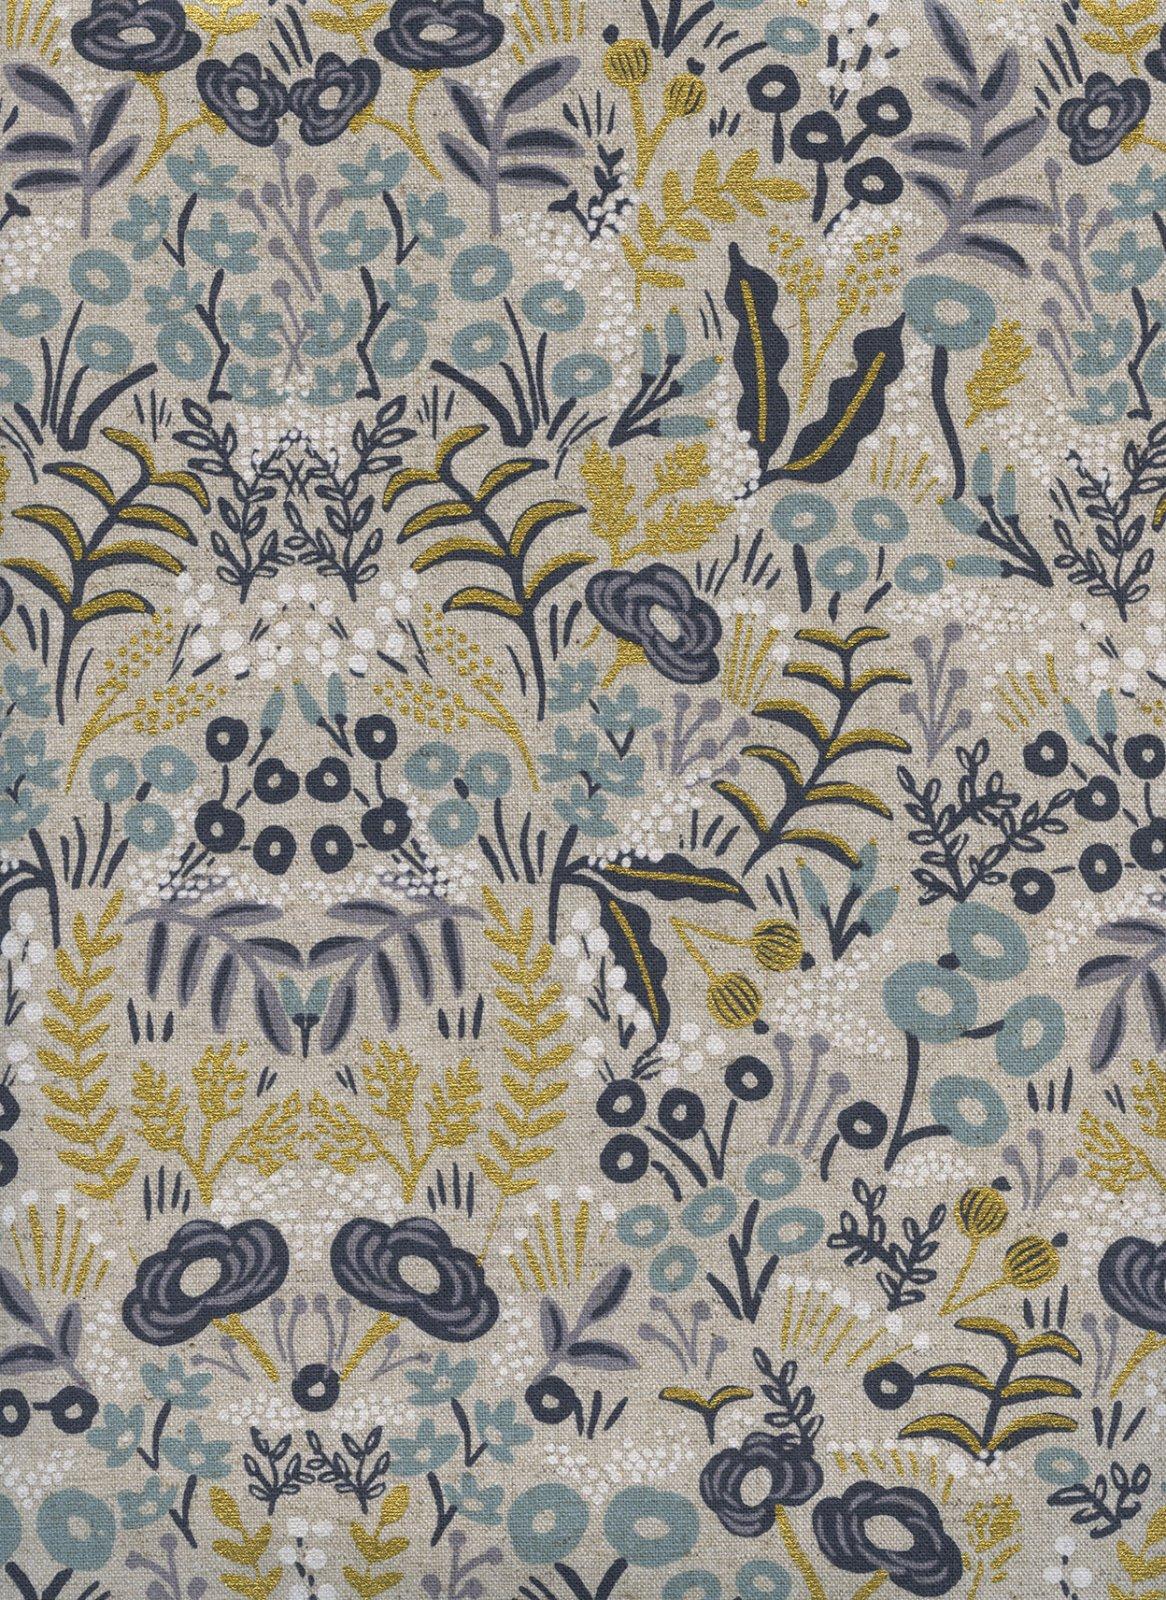 AB8040-12 Natural Gold Flowers Menagerie Linen/Cotton CANVAS Rifle Paper Co